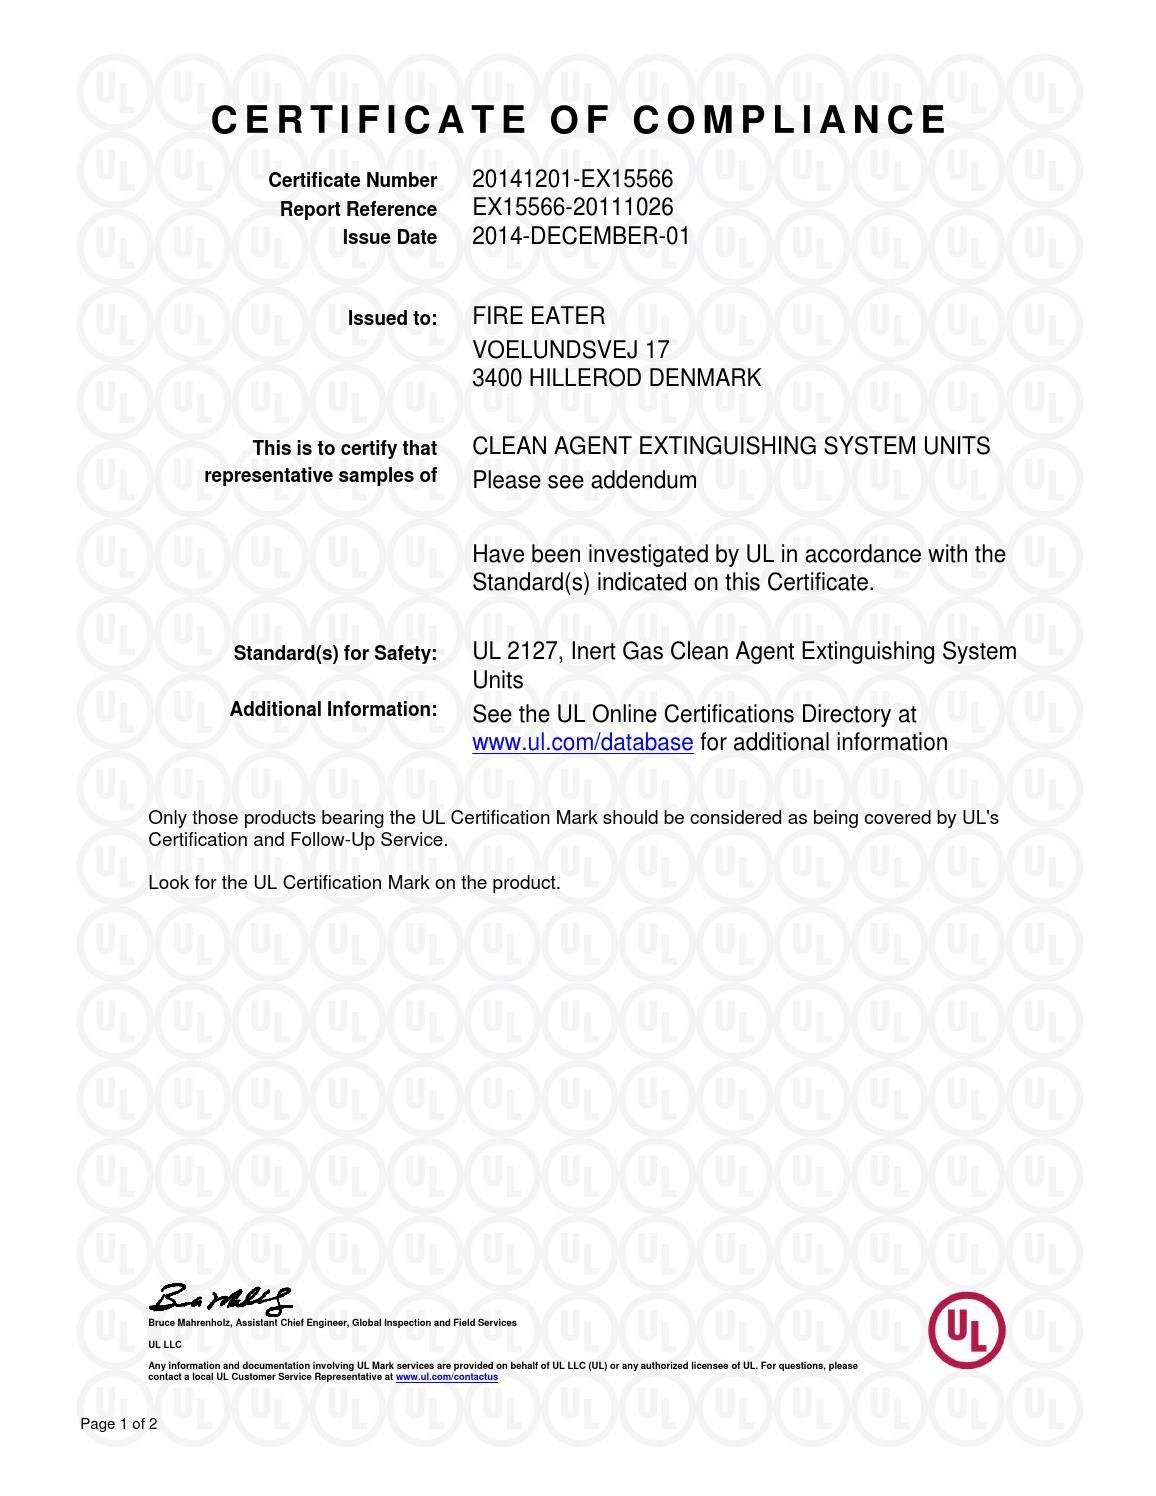 Fire Eater Ul Certificate Of Compliance 2014 12 01 By Fire Eater Issuu